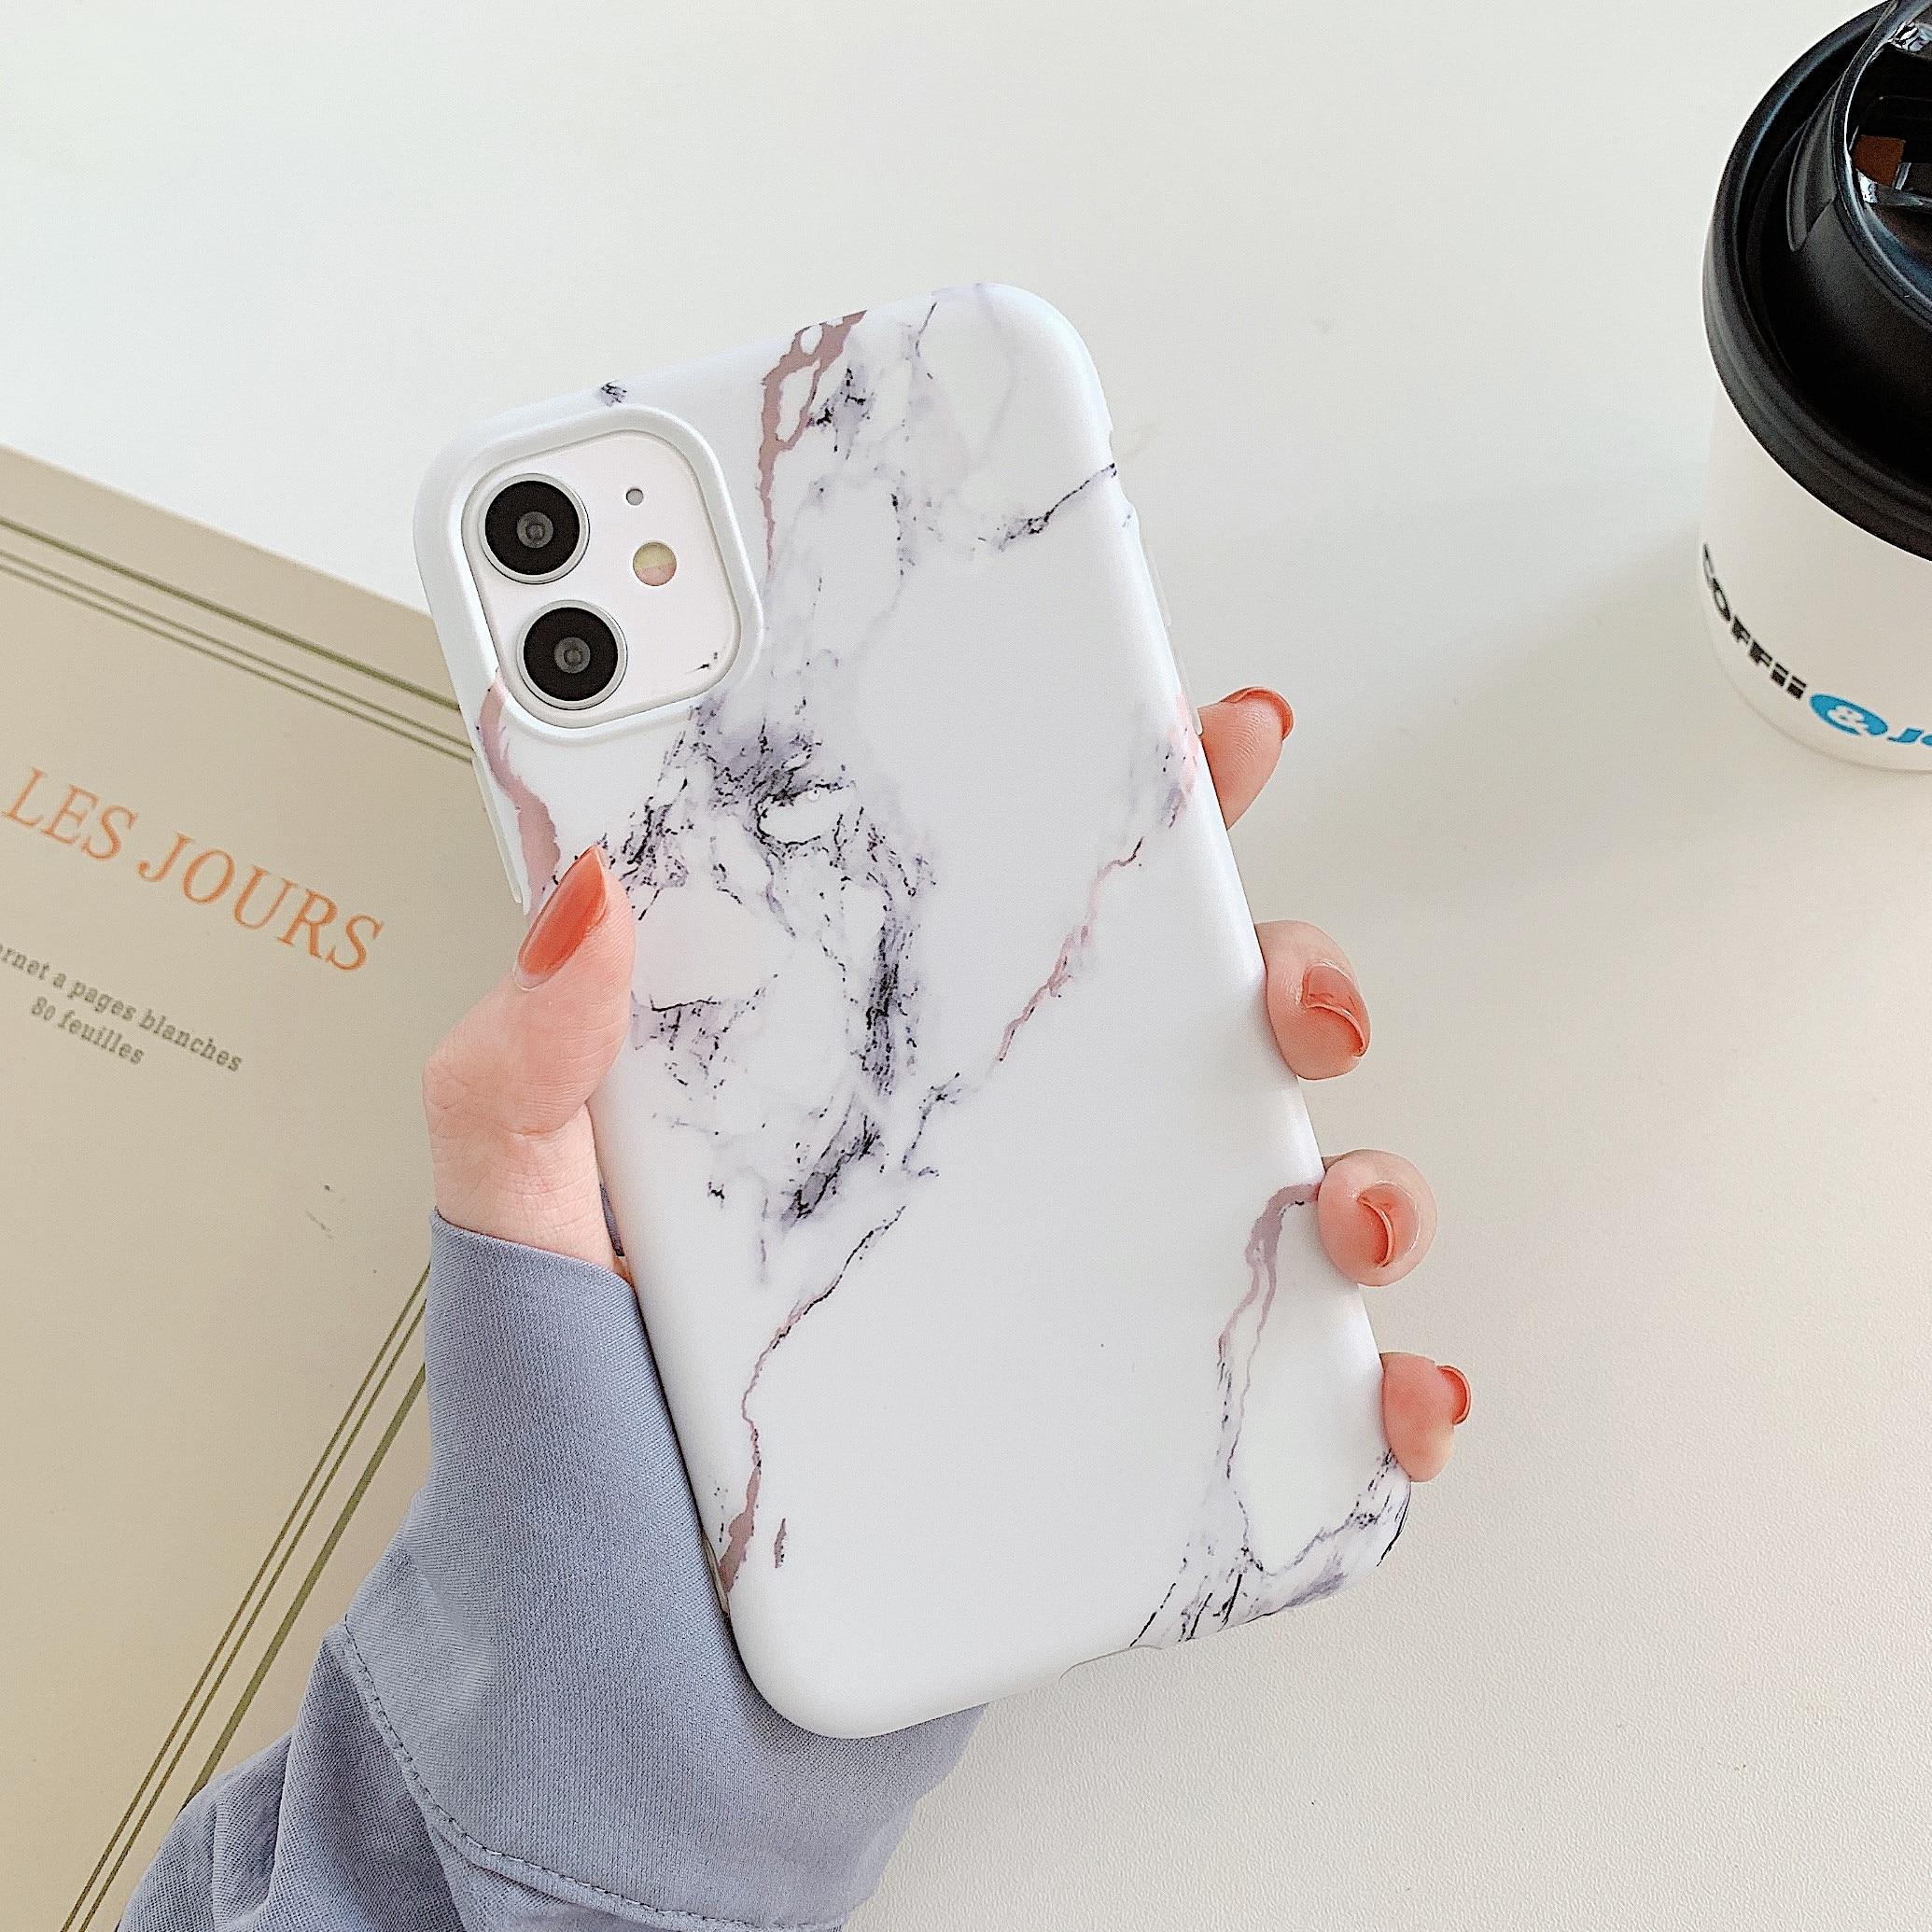 H3356447016704228a4fda783f93412fdd Capinha celular case Mármore rachadura matte casos de telefone para iphone 12 mini 11 pro max se 2020 xs max xr x 7 8 plus capa de silicone macio tpu imd volta